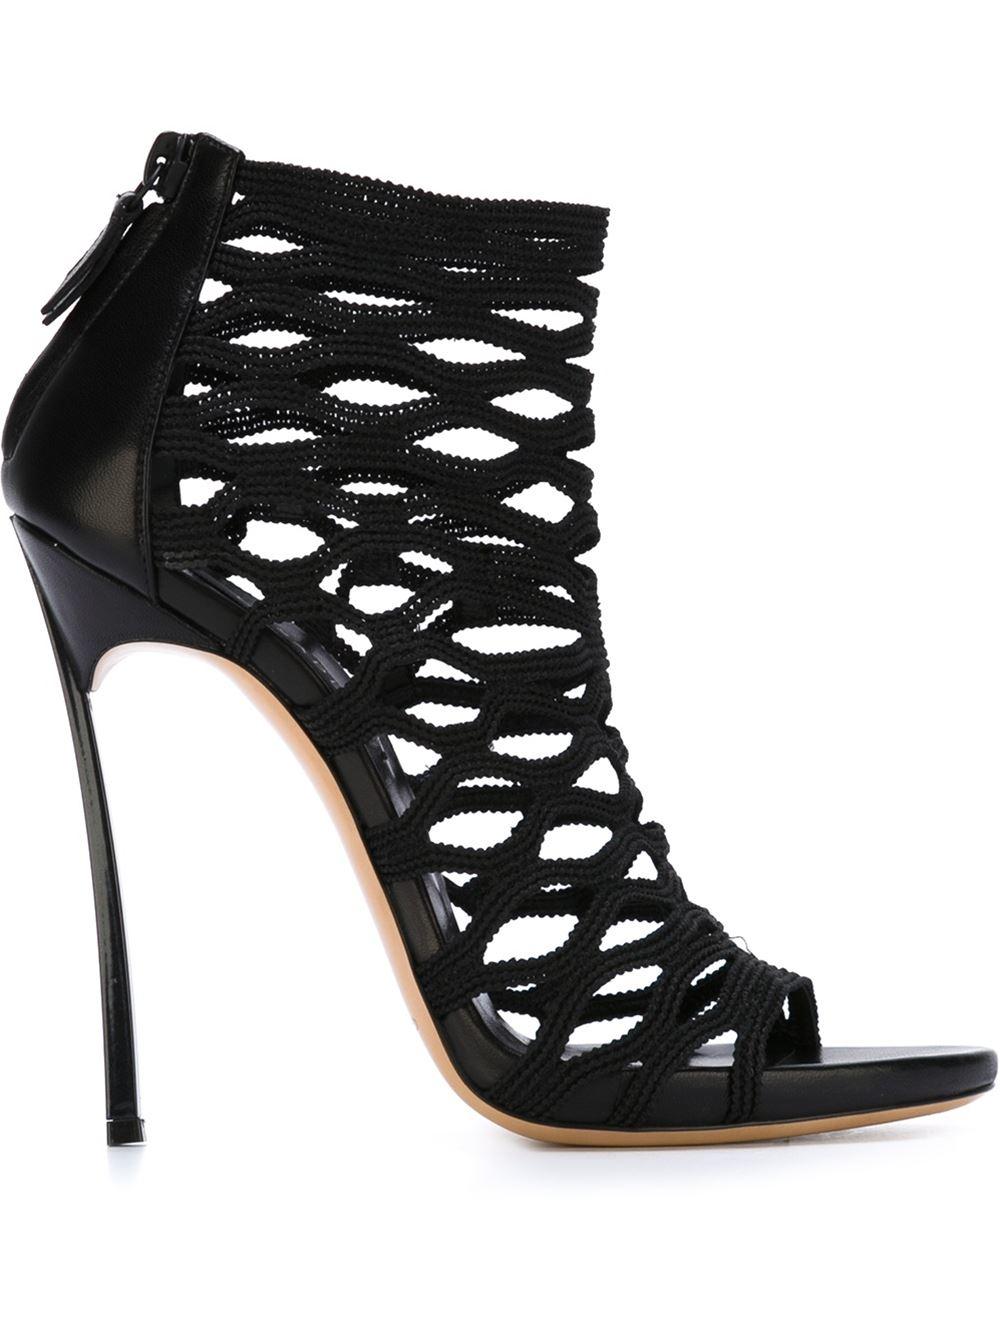 Lyst Casadei Strappy Stiletto Sandals In Black